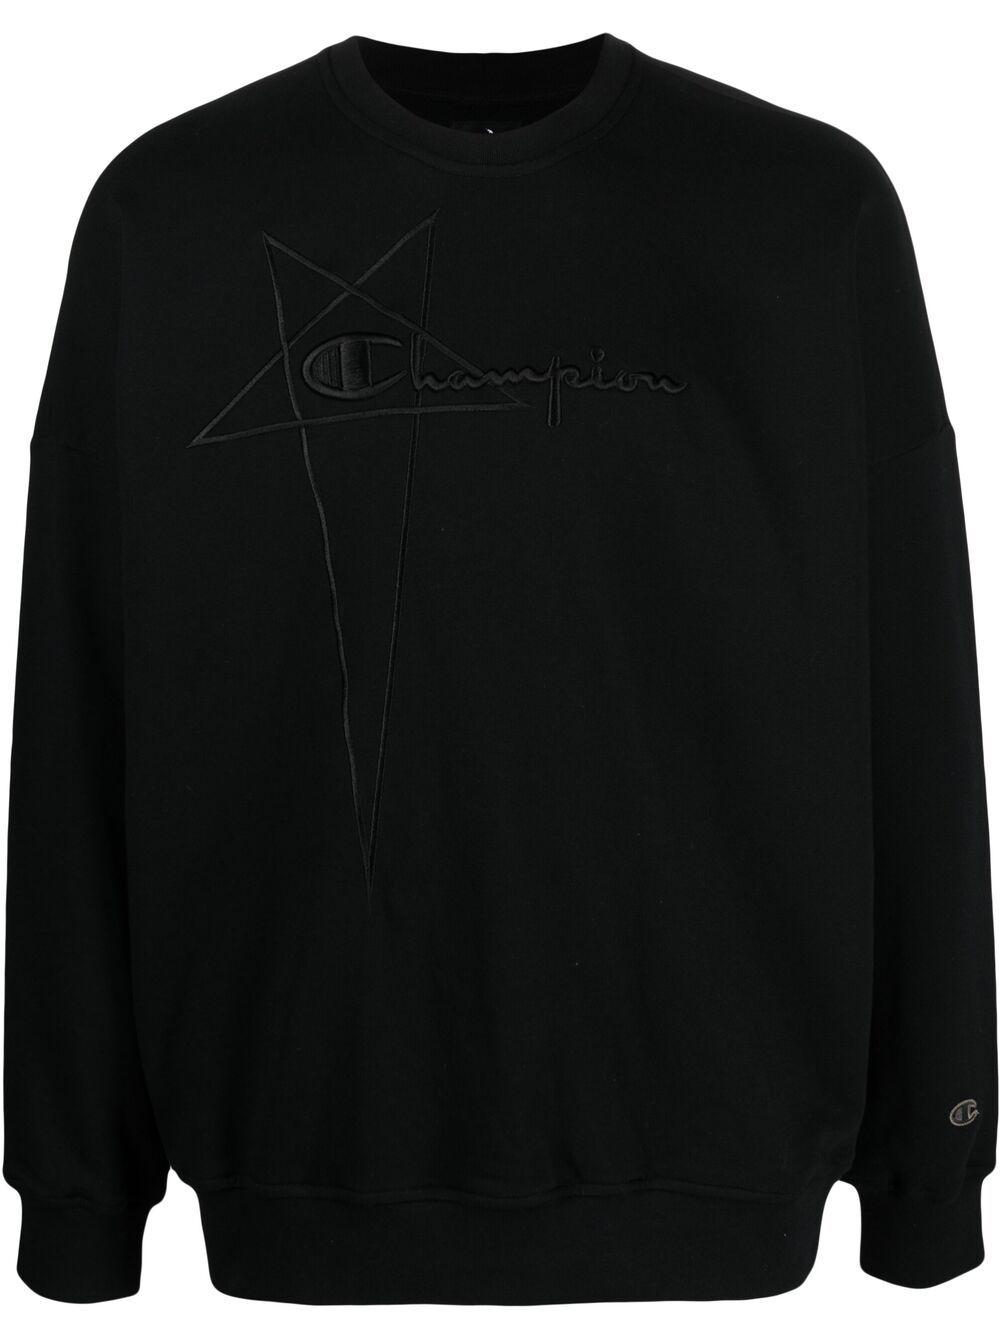 Rick Owens X Champion felpa con logo ricamato uomo nero RICK OWENS X CHAMPION | Felpe | CM21S0005 21676009